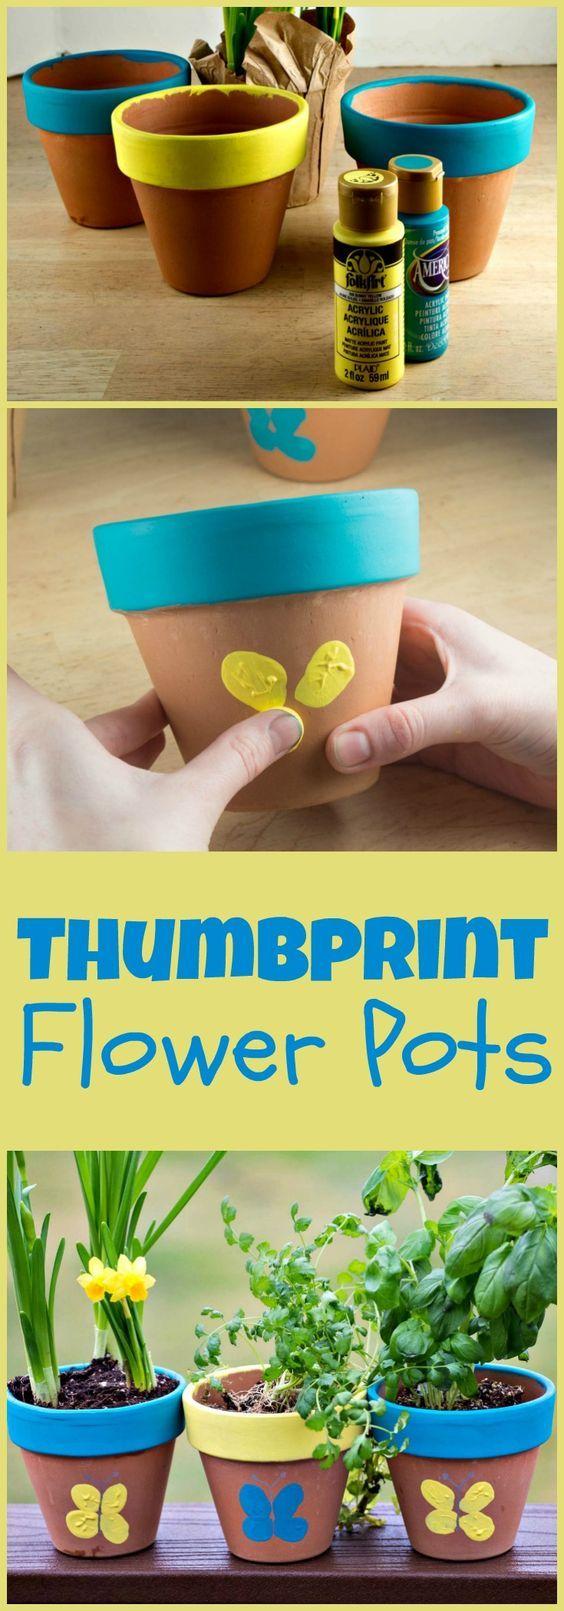 Thumbprint Flower Pots